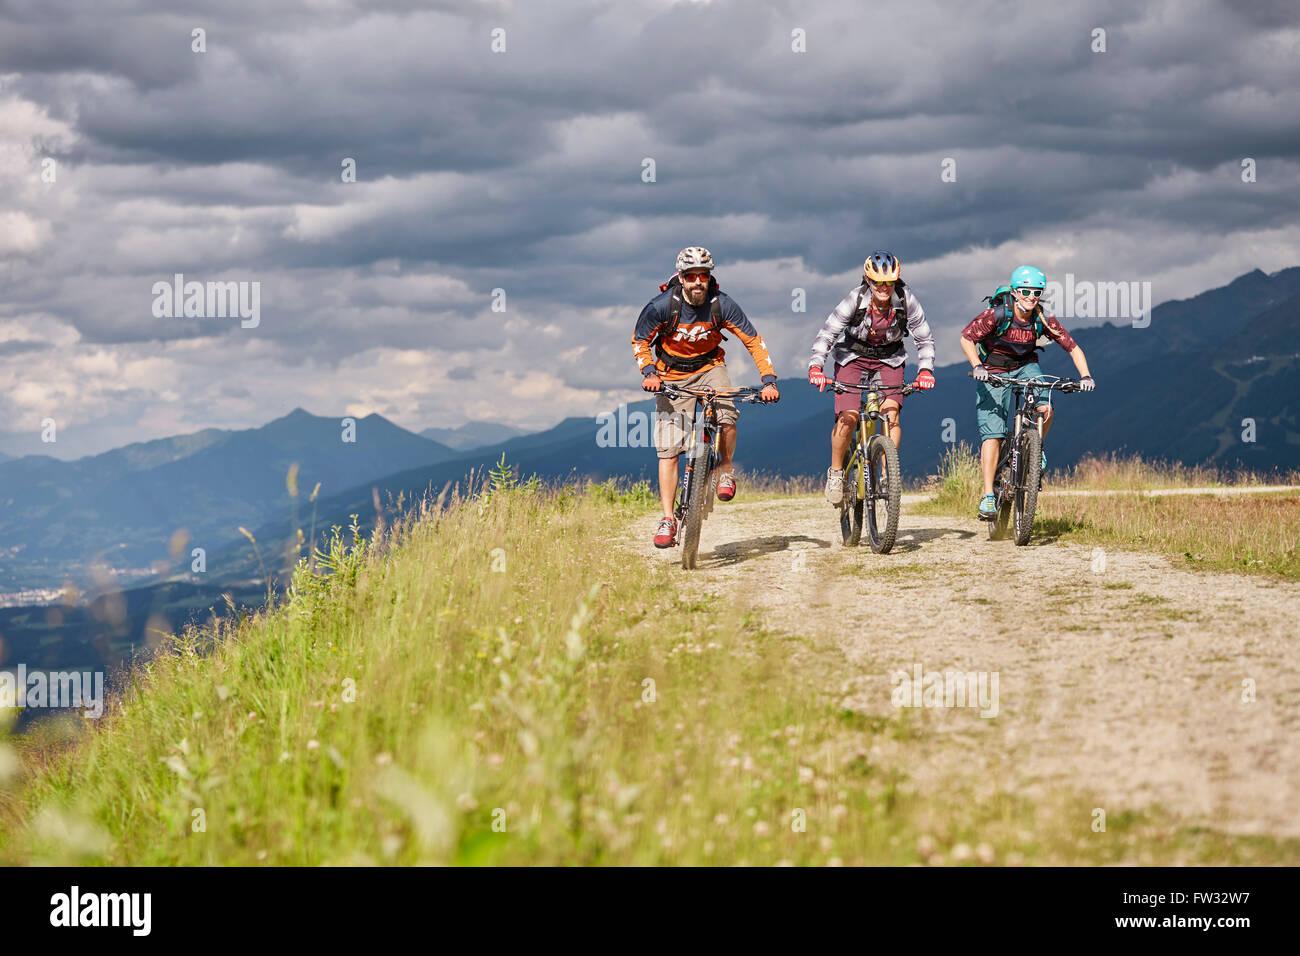 Three mountain bikers with helmets riding on a gravel road, Mutterer Alm near Innsbruck, Tyrol, Austria - Stock Image